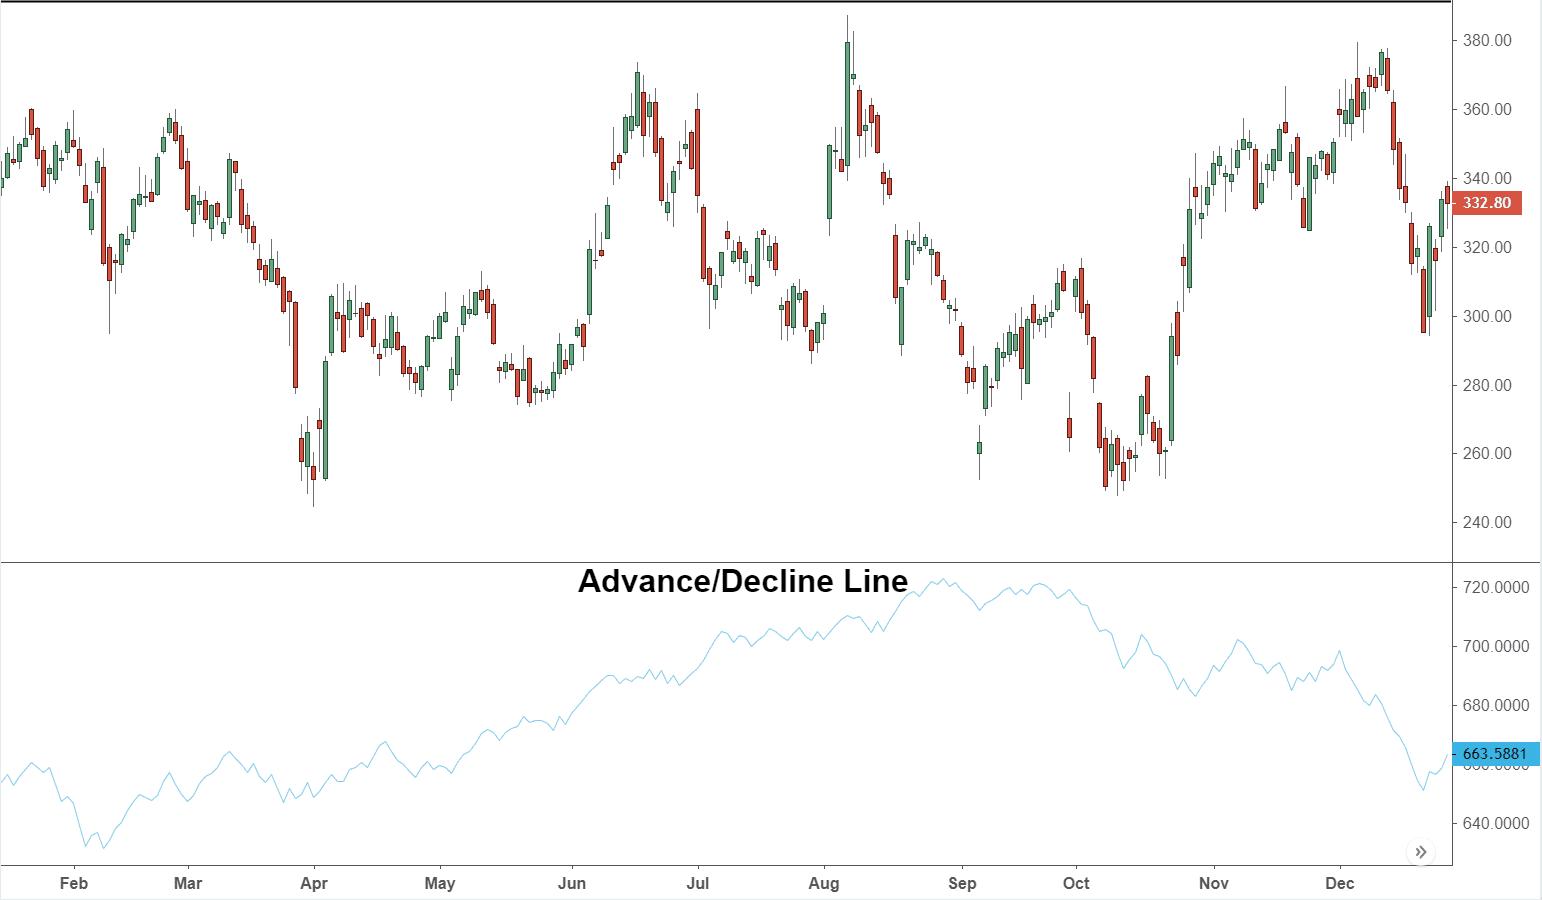 Advance/Decline Line - A/D Definition and Uses